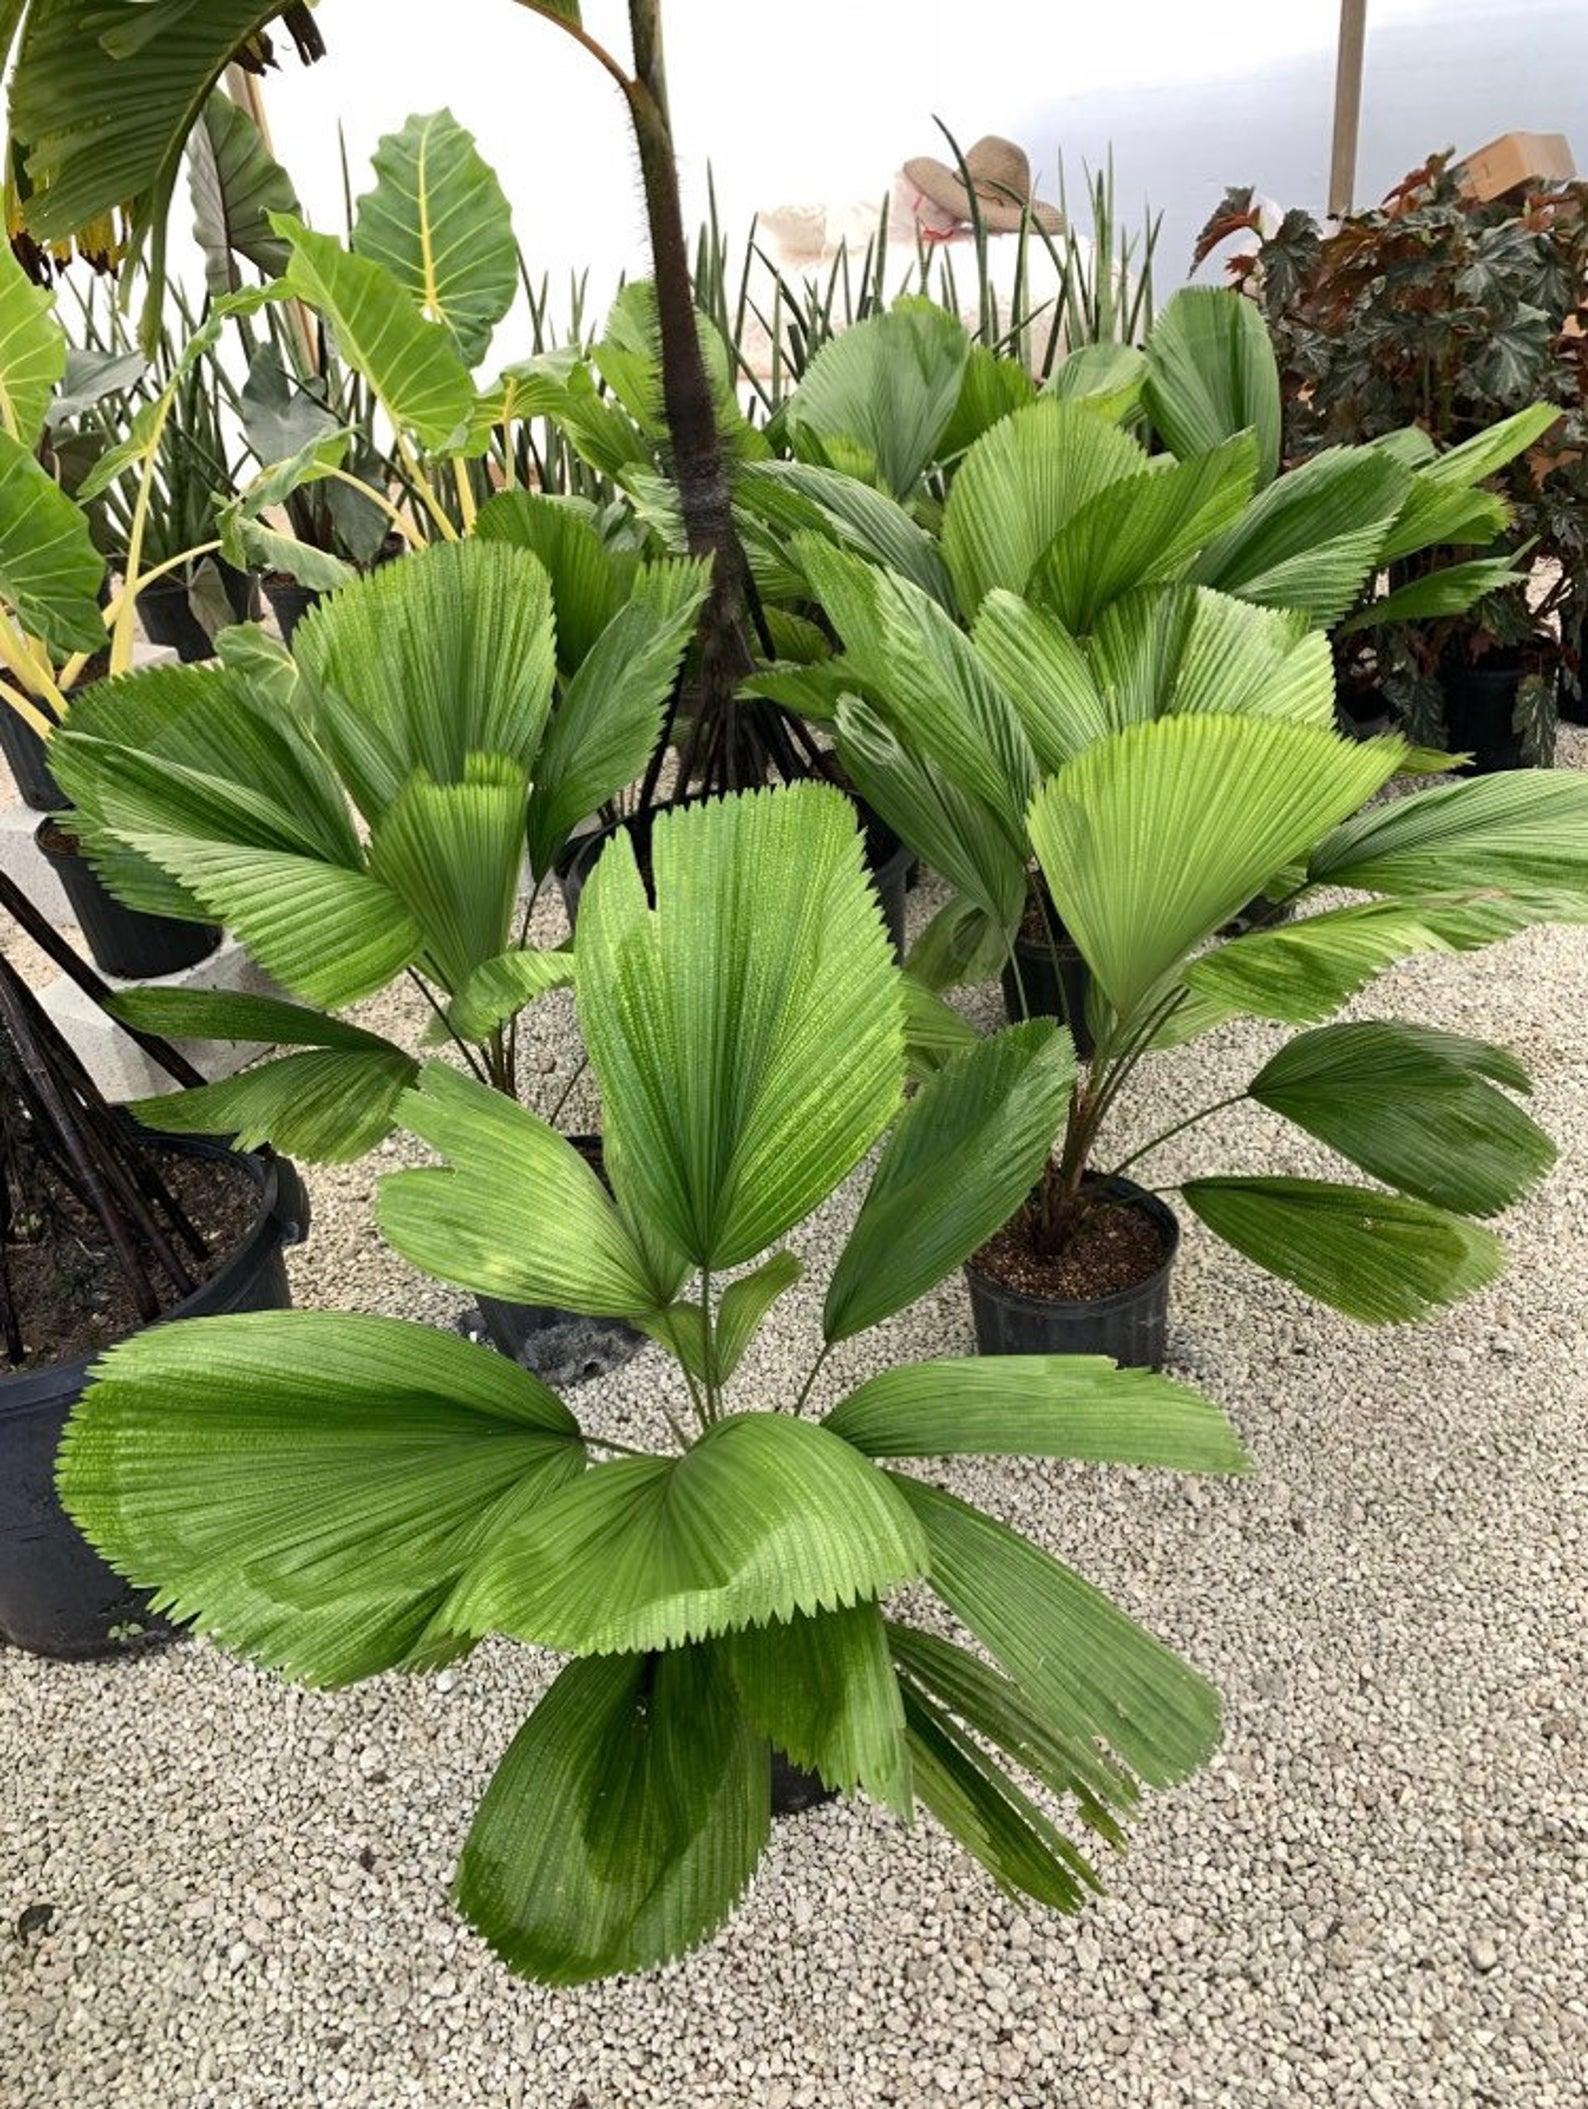 Fan Palm - Image via Bijan Tropicals (Etsy)